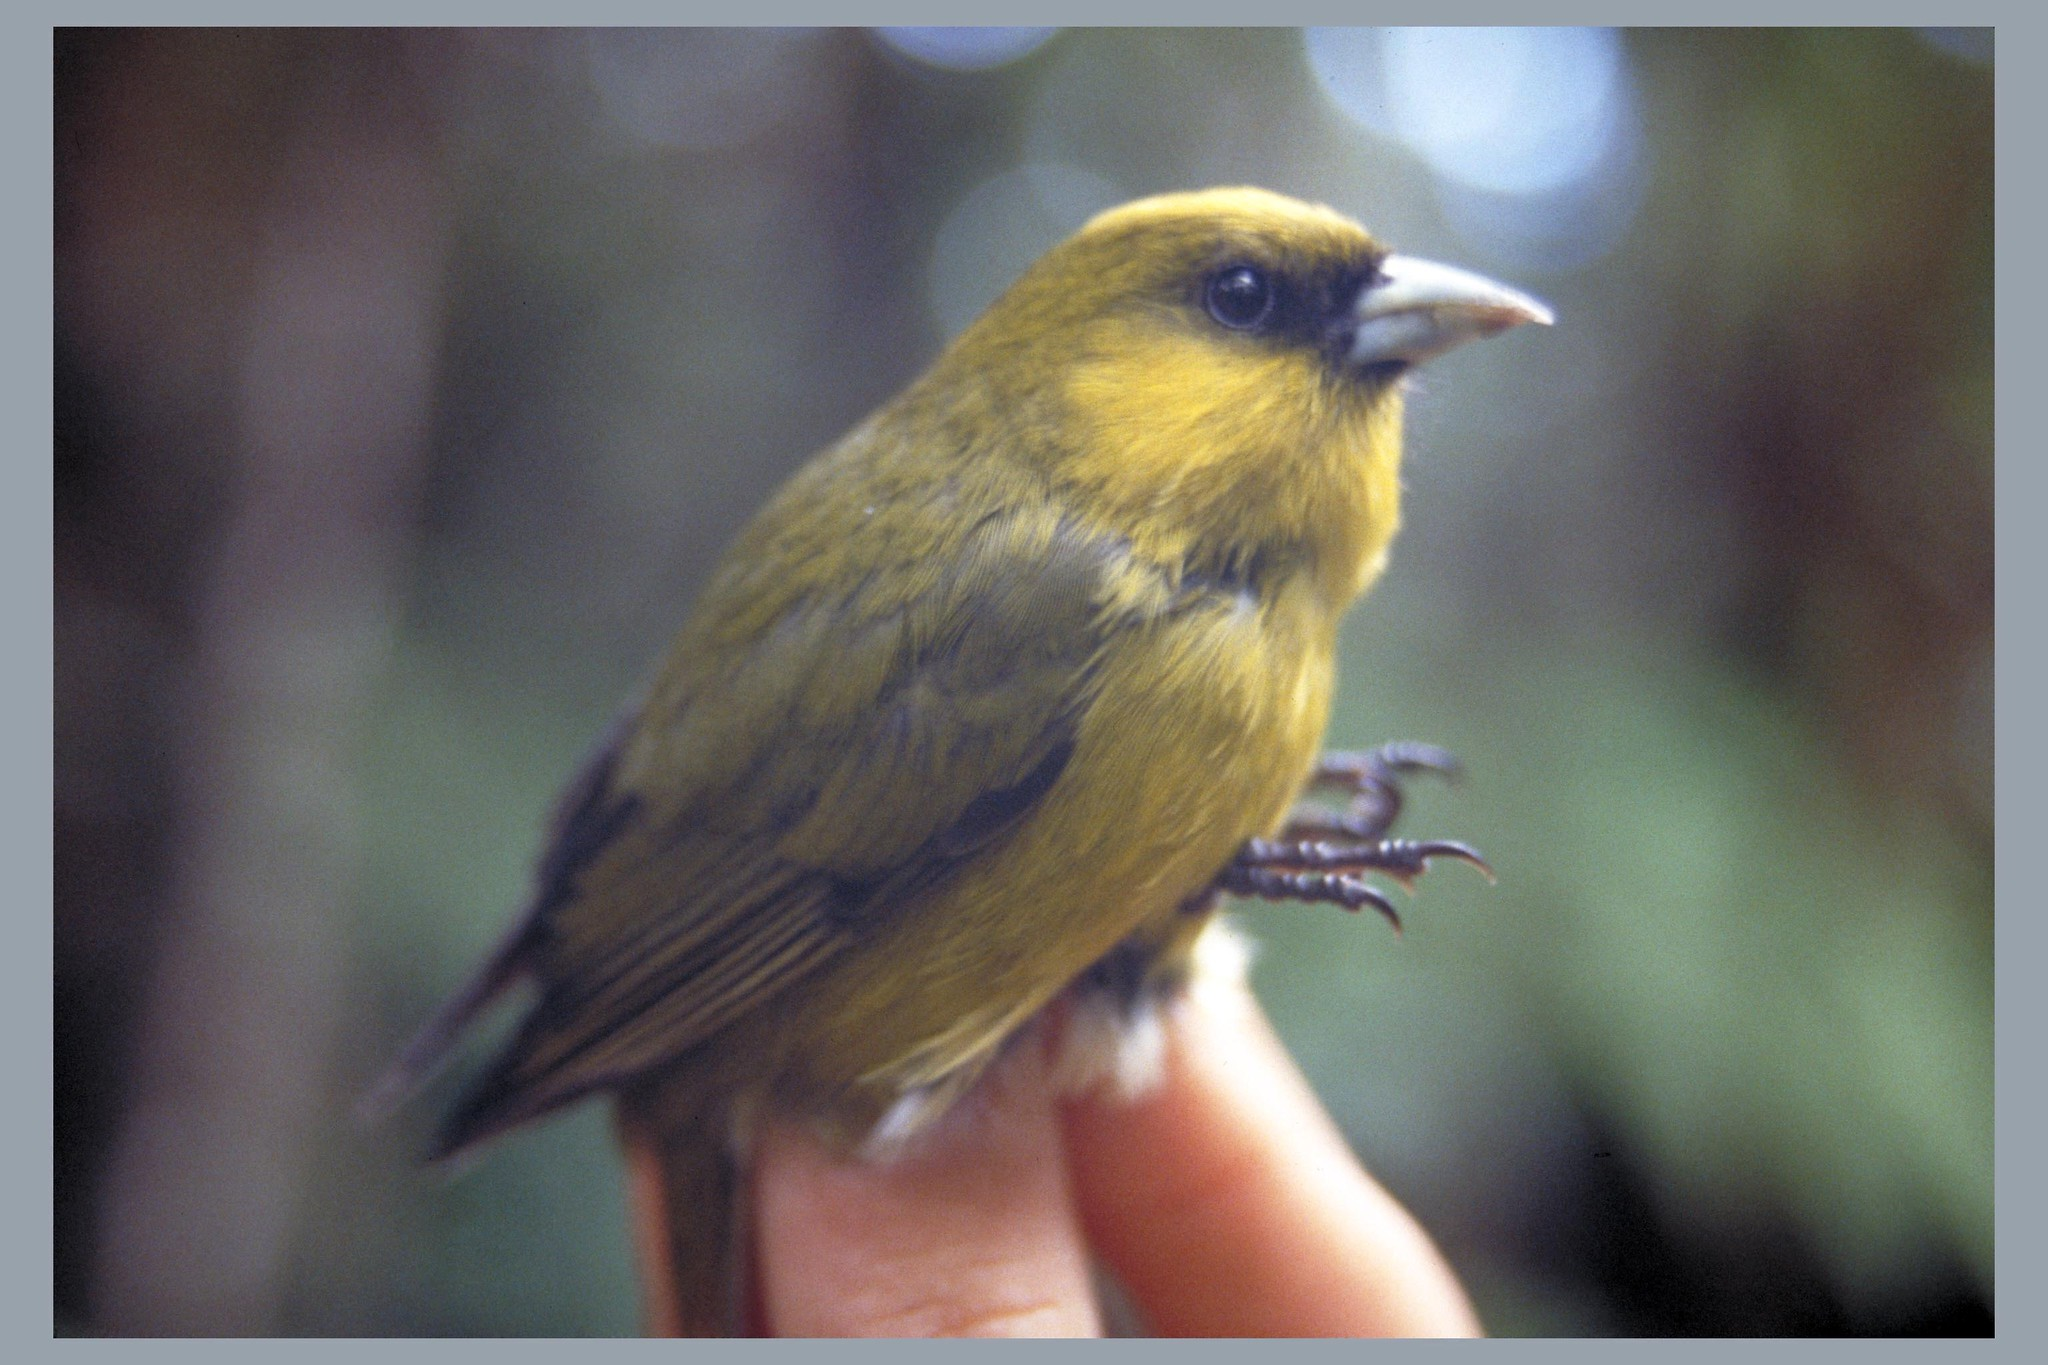 Photo of the critically endangered 'akikiki